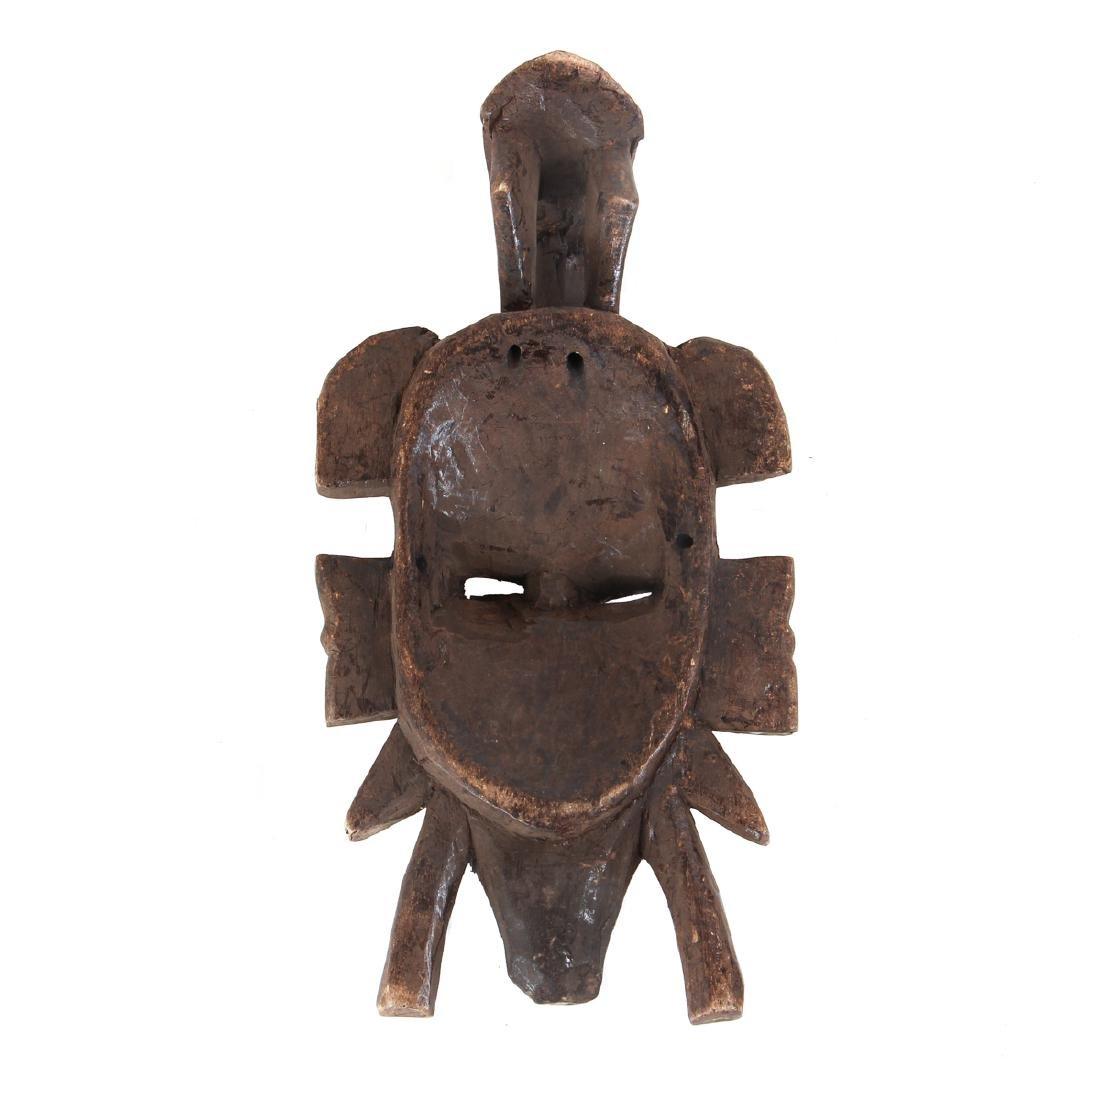 Senufu Peoples Mask - 2